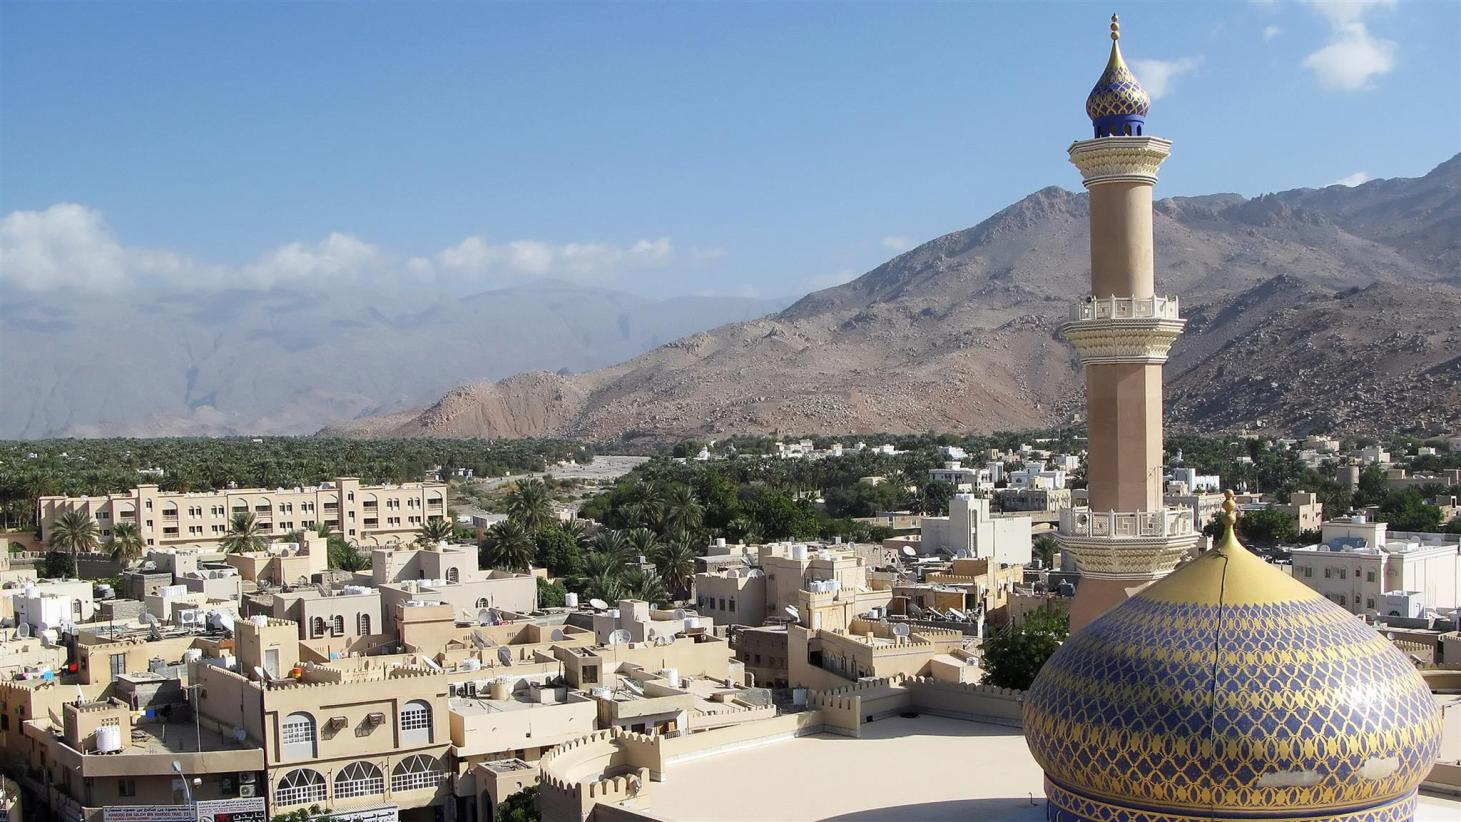 10 Best Nizwa Hotels: HD Photos + Reviews of Hotels in Nizwa, Oman